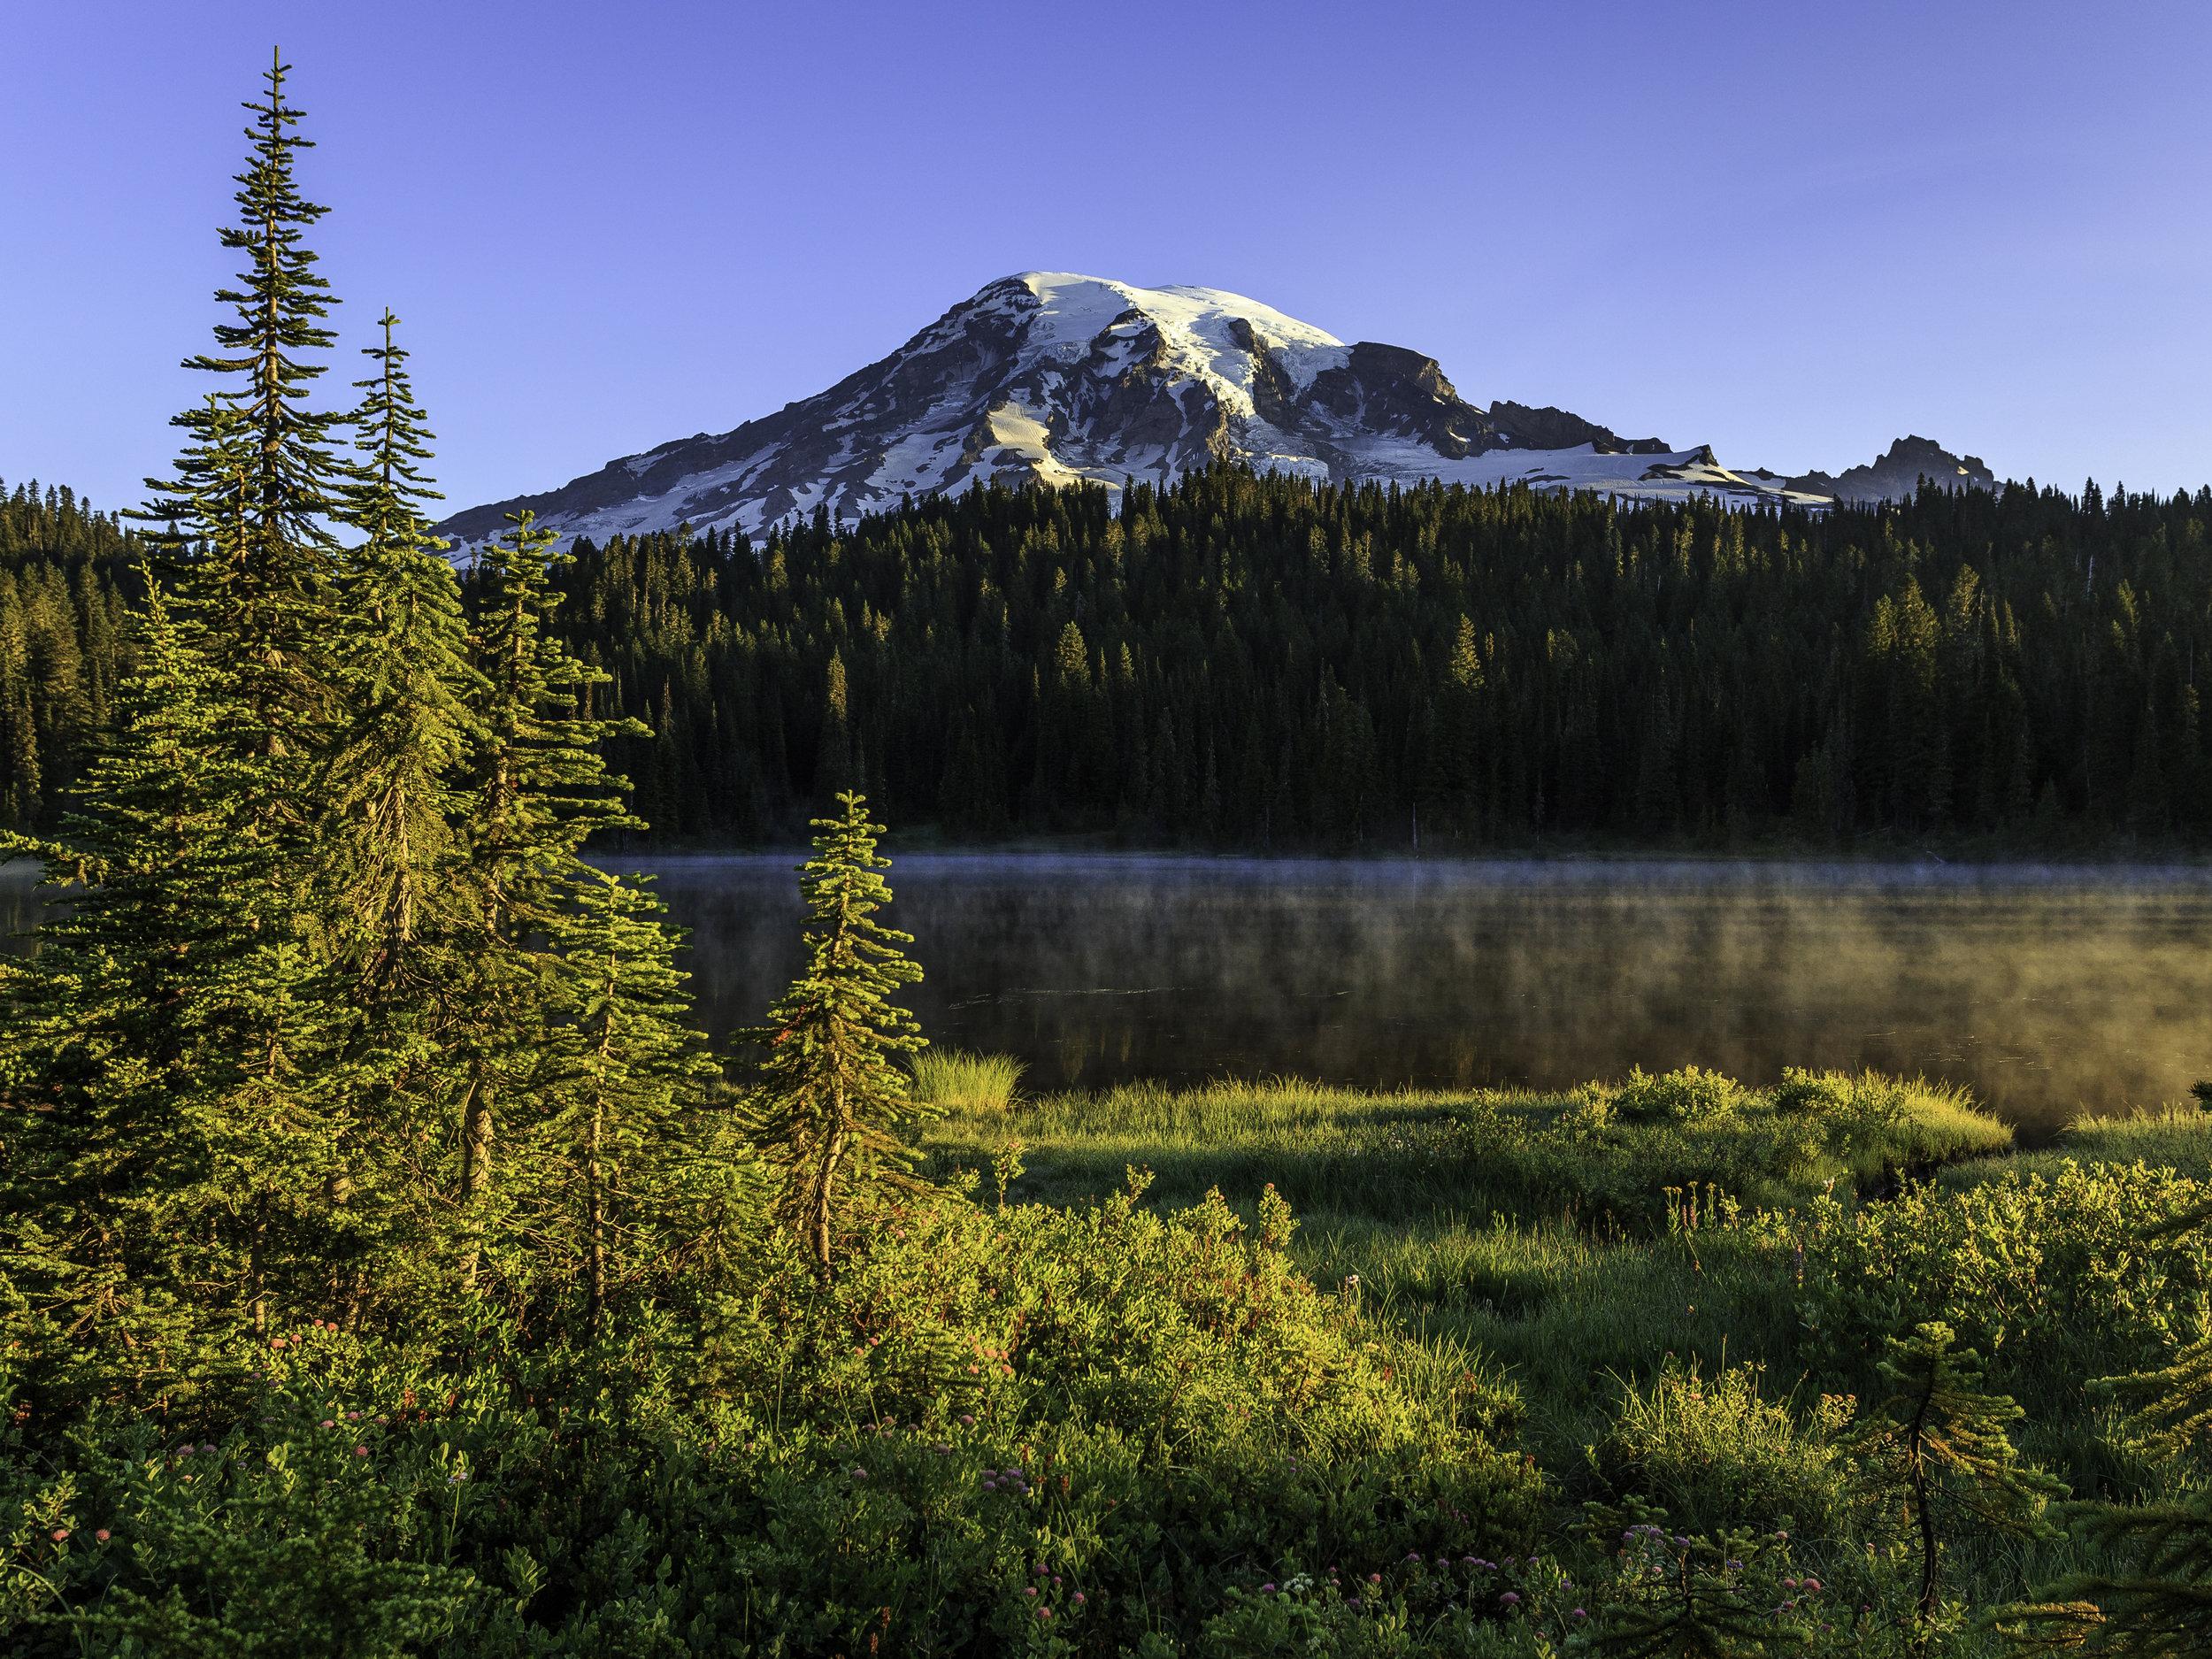 Reflection Lake, Mount Rainier National Park, Washington